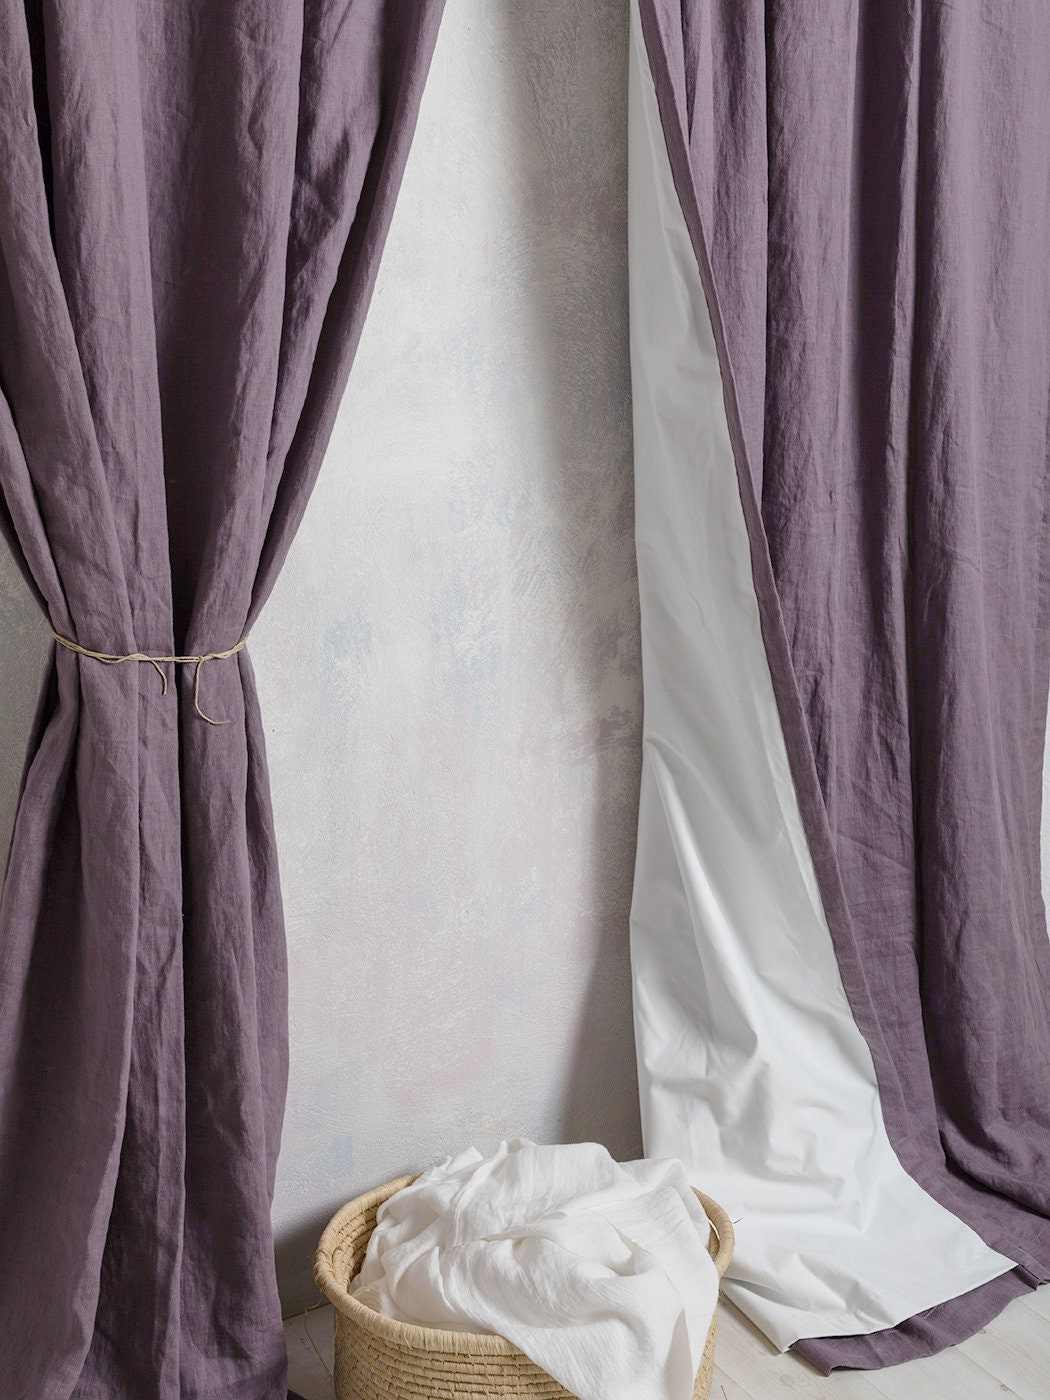 Linen Curtain Panel Linen Curtains Linen Drape In Purple Grey Color Curtain Black Out Linen Curtain Width 52 132cm X Custom Lenght